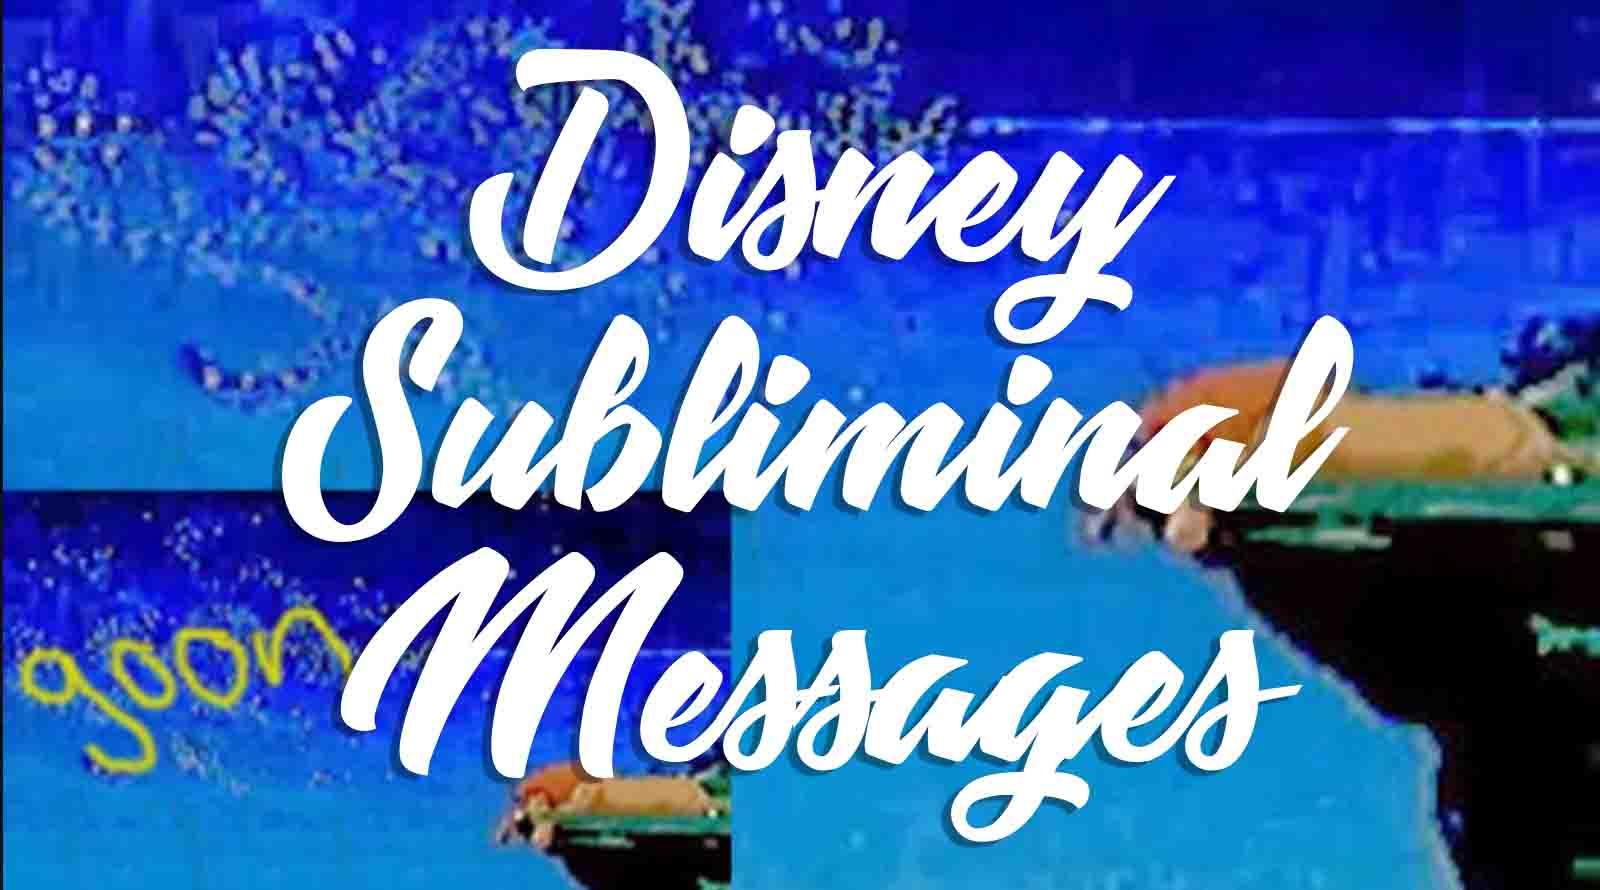 16 of the riskiest disney subliminal messages